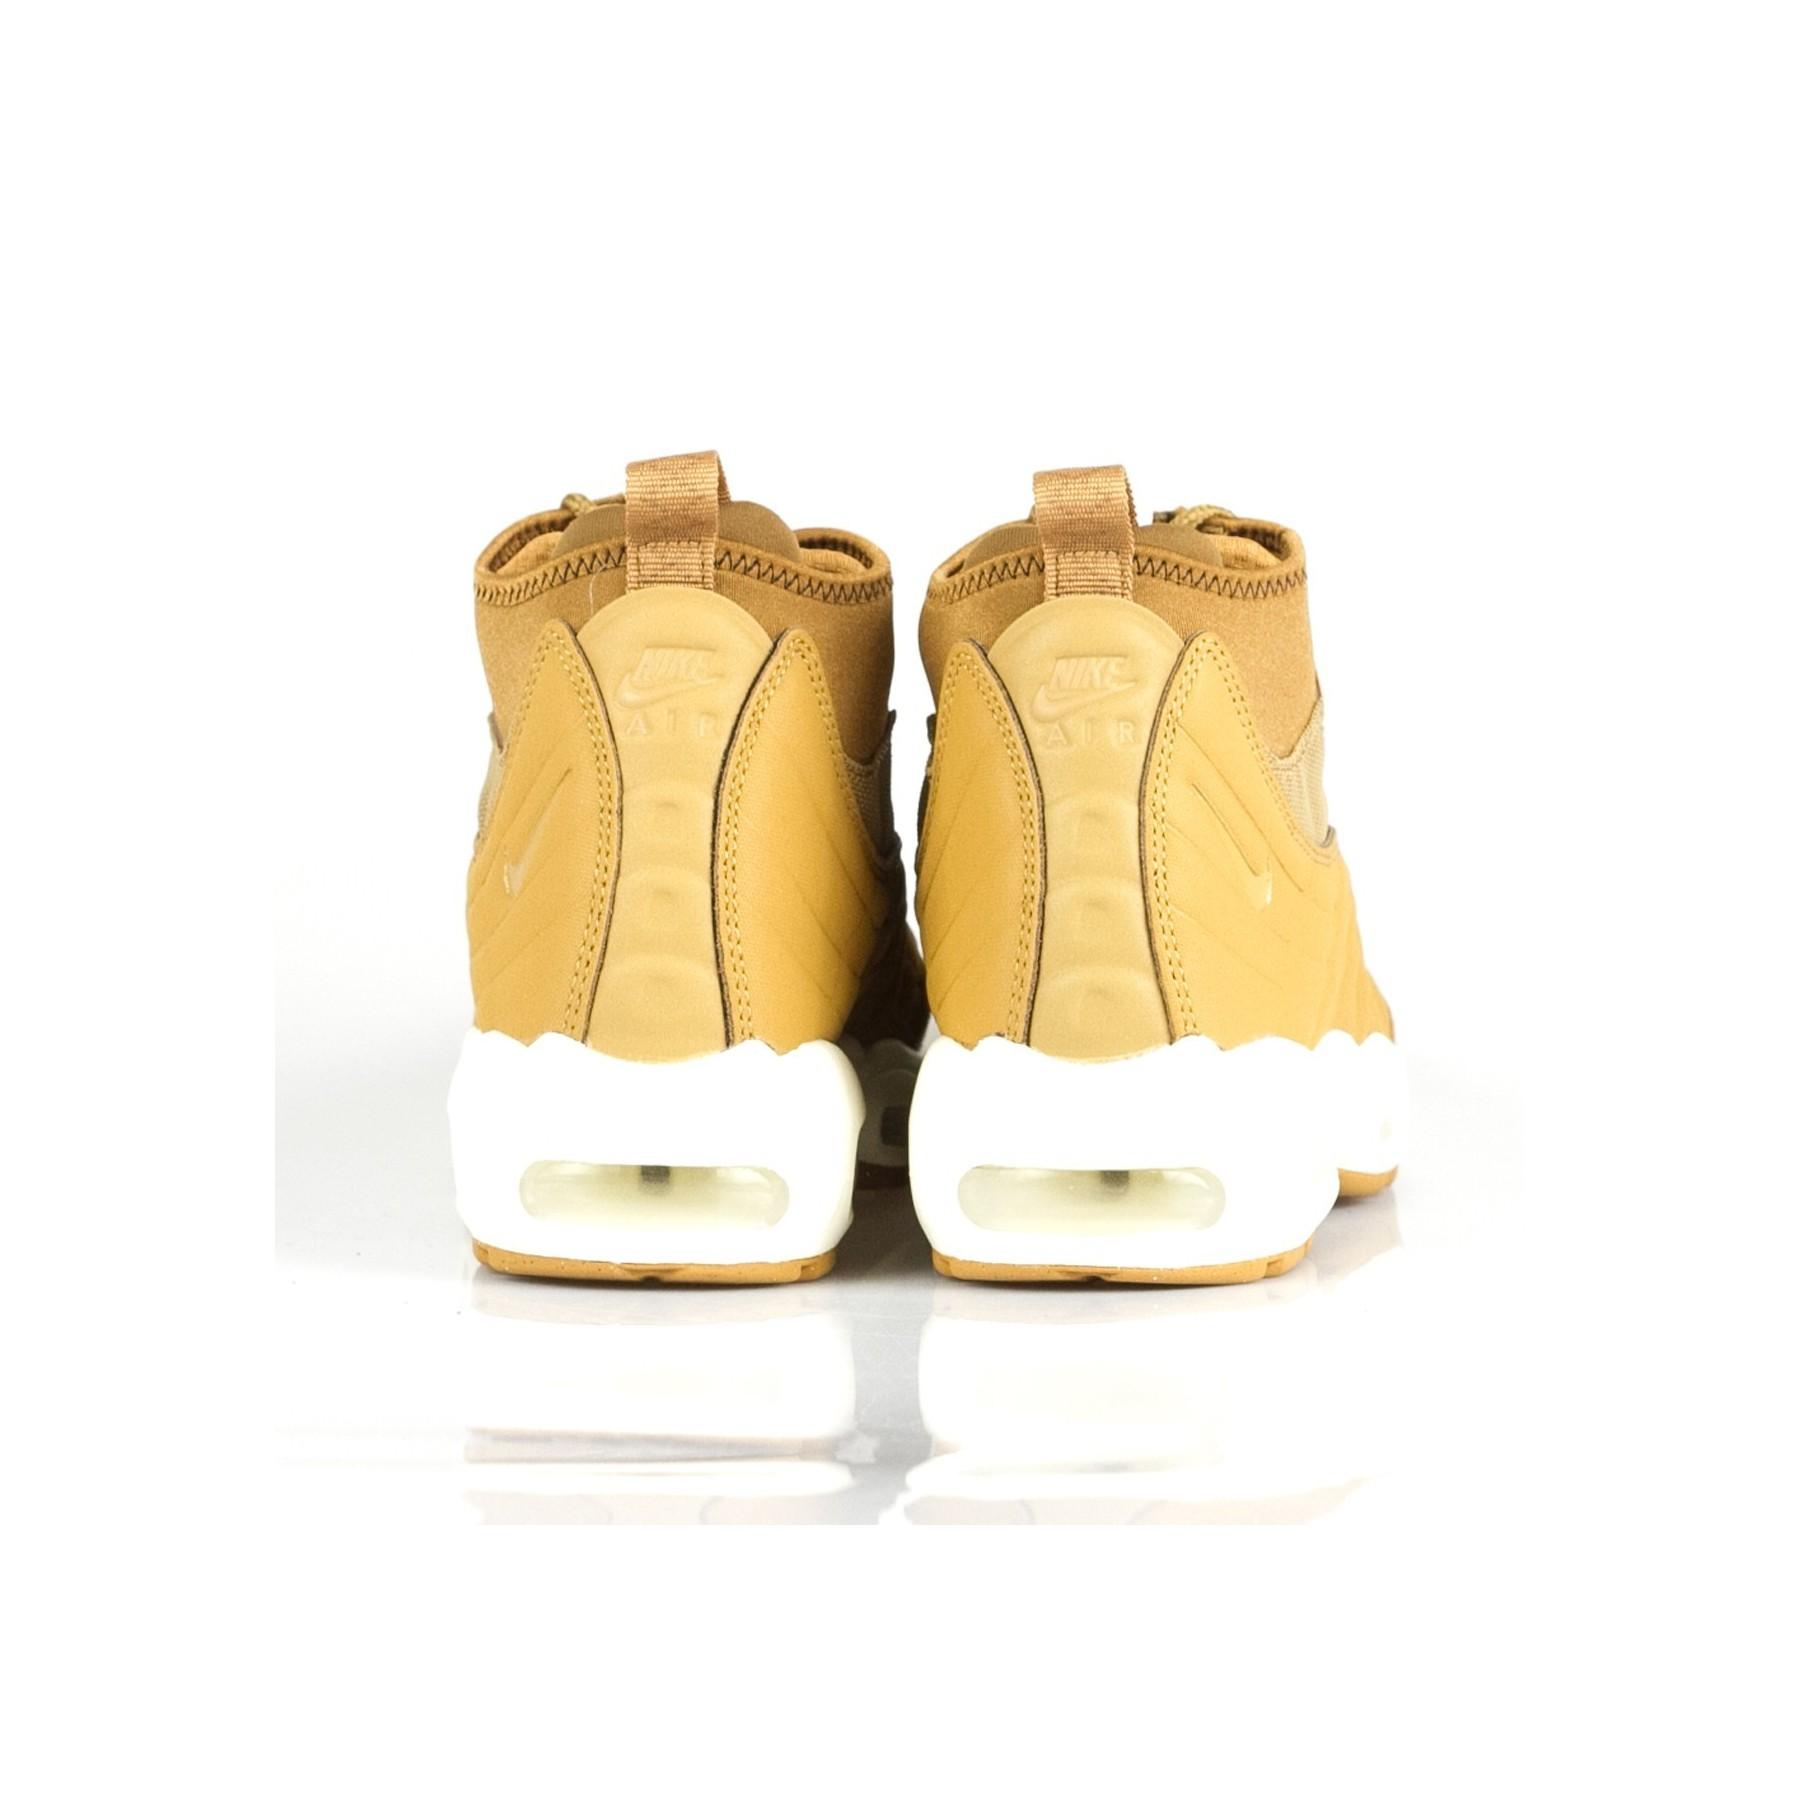 Nike Air Max 95 Sneakerboot Flax Flax Ale Brown Sail   Footshop